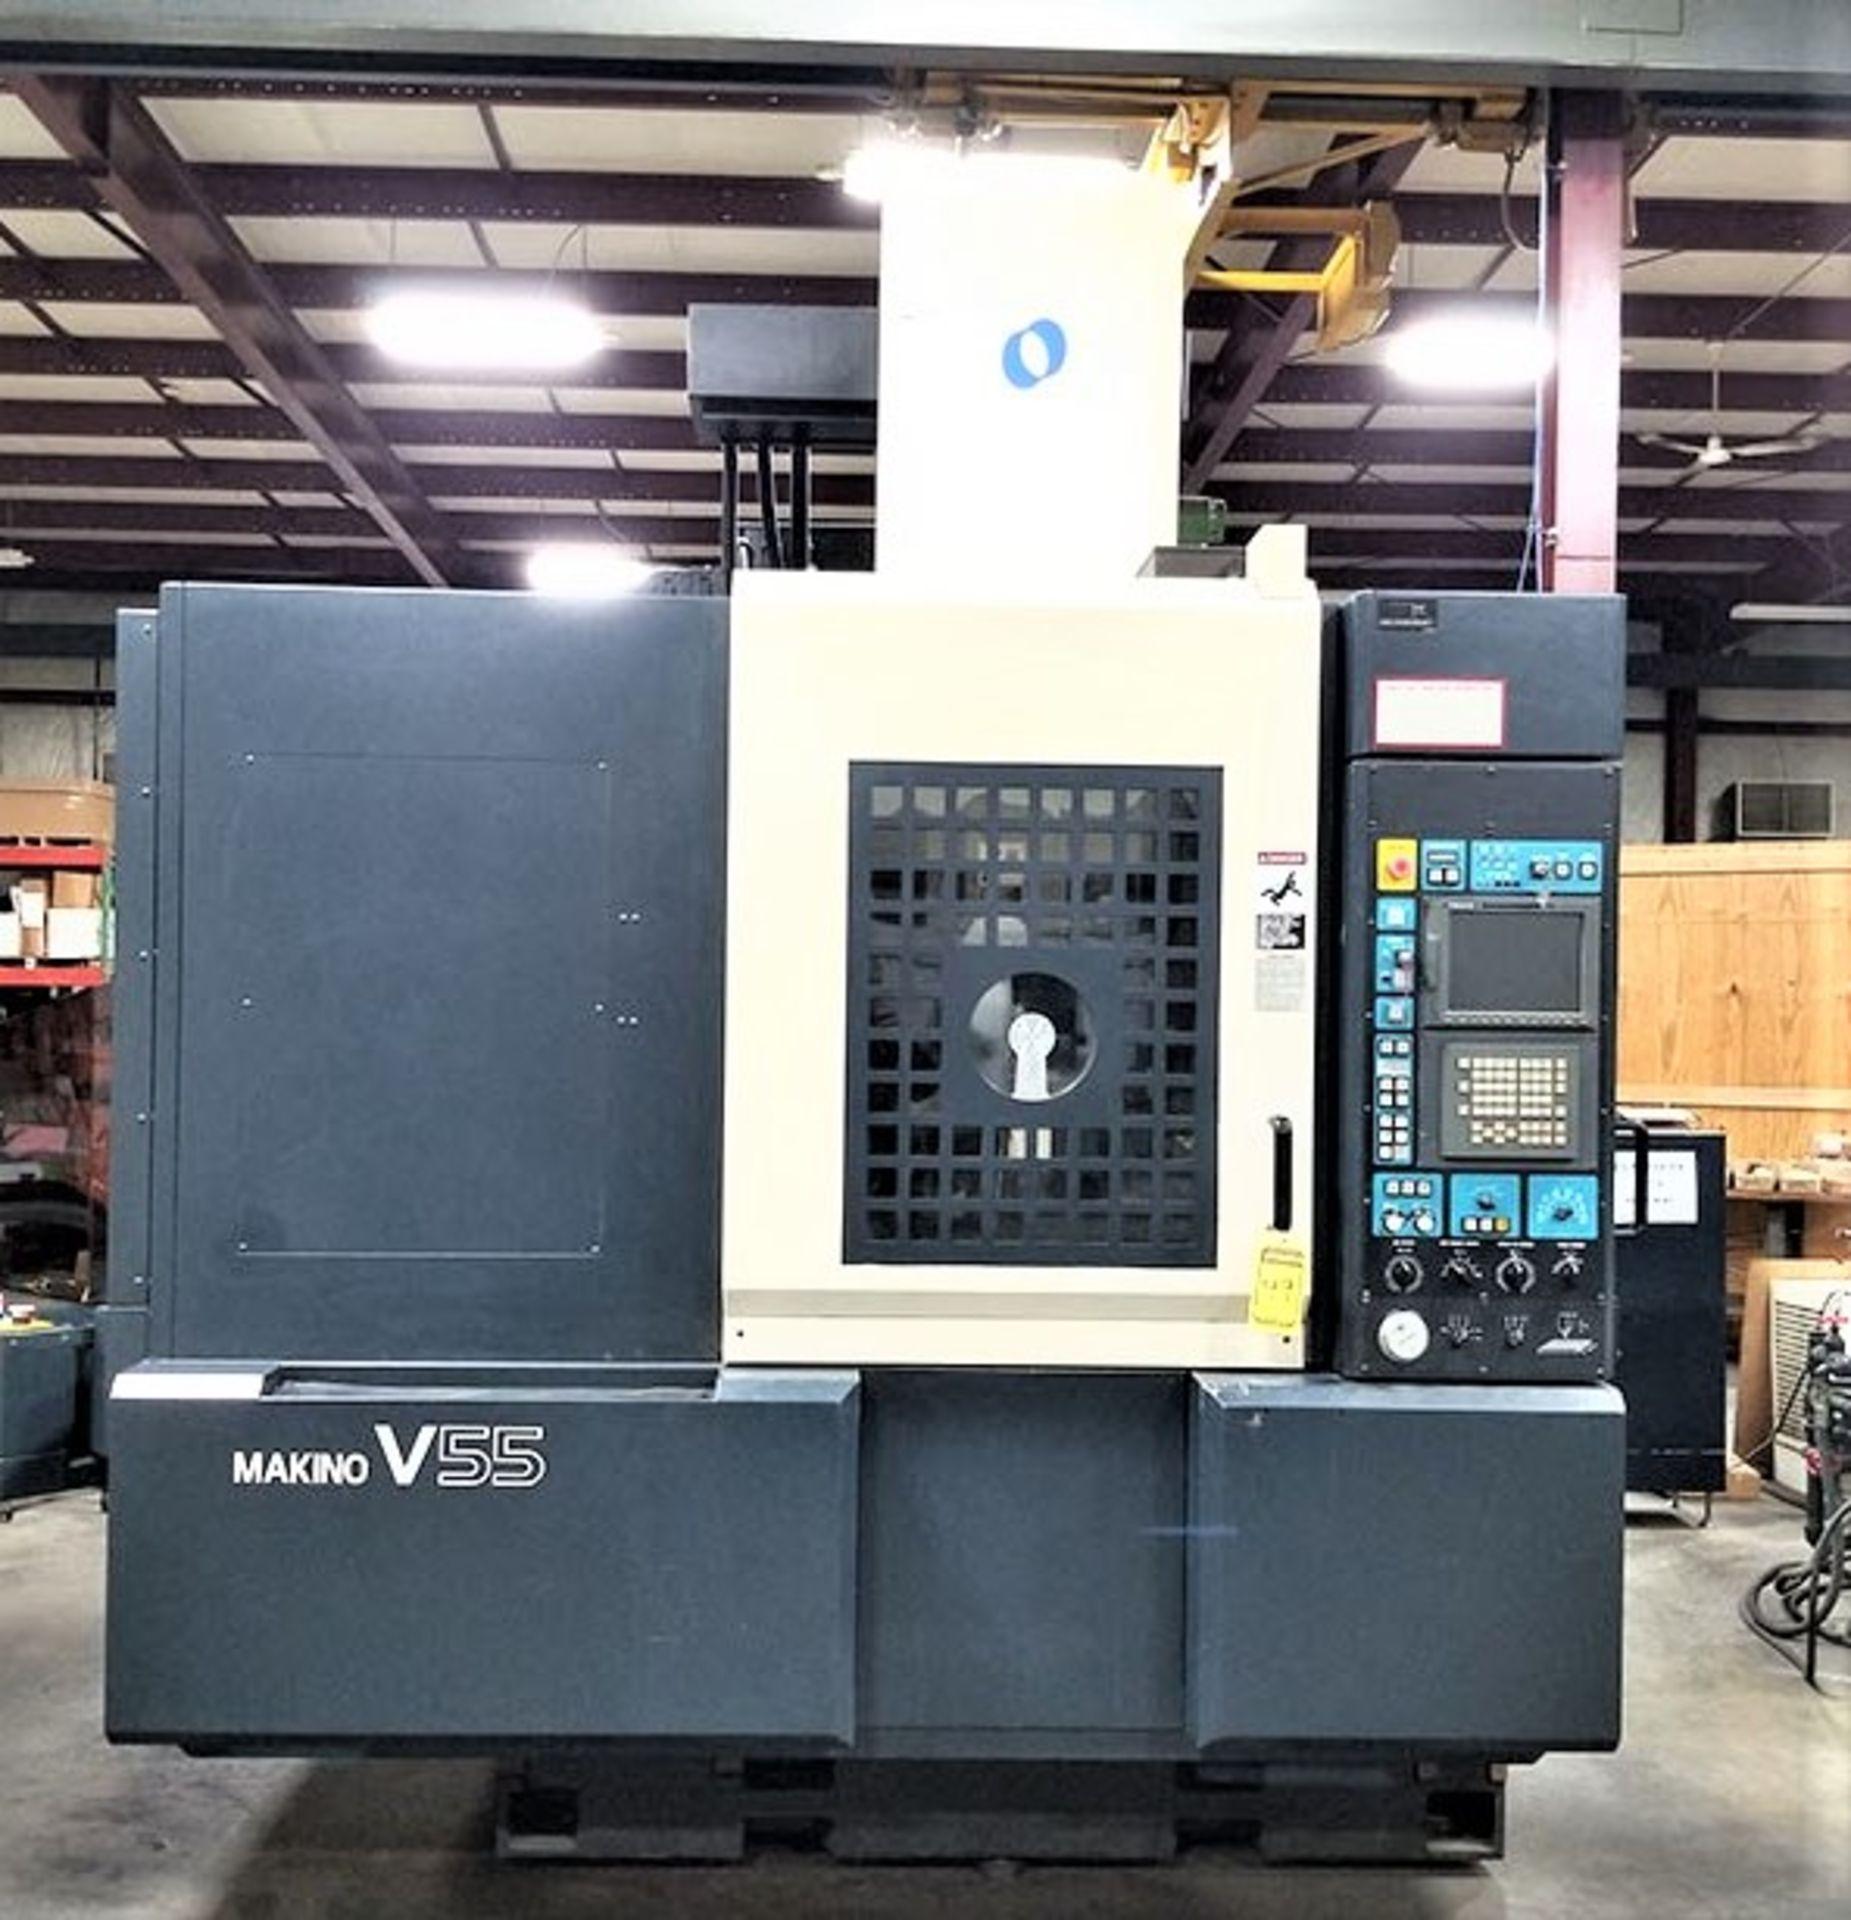 Lot 52 - Makino V55 Precision 3-Axis CNC Vertical Machining Center, S/N 864, New 2000